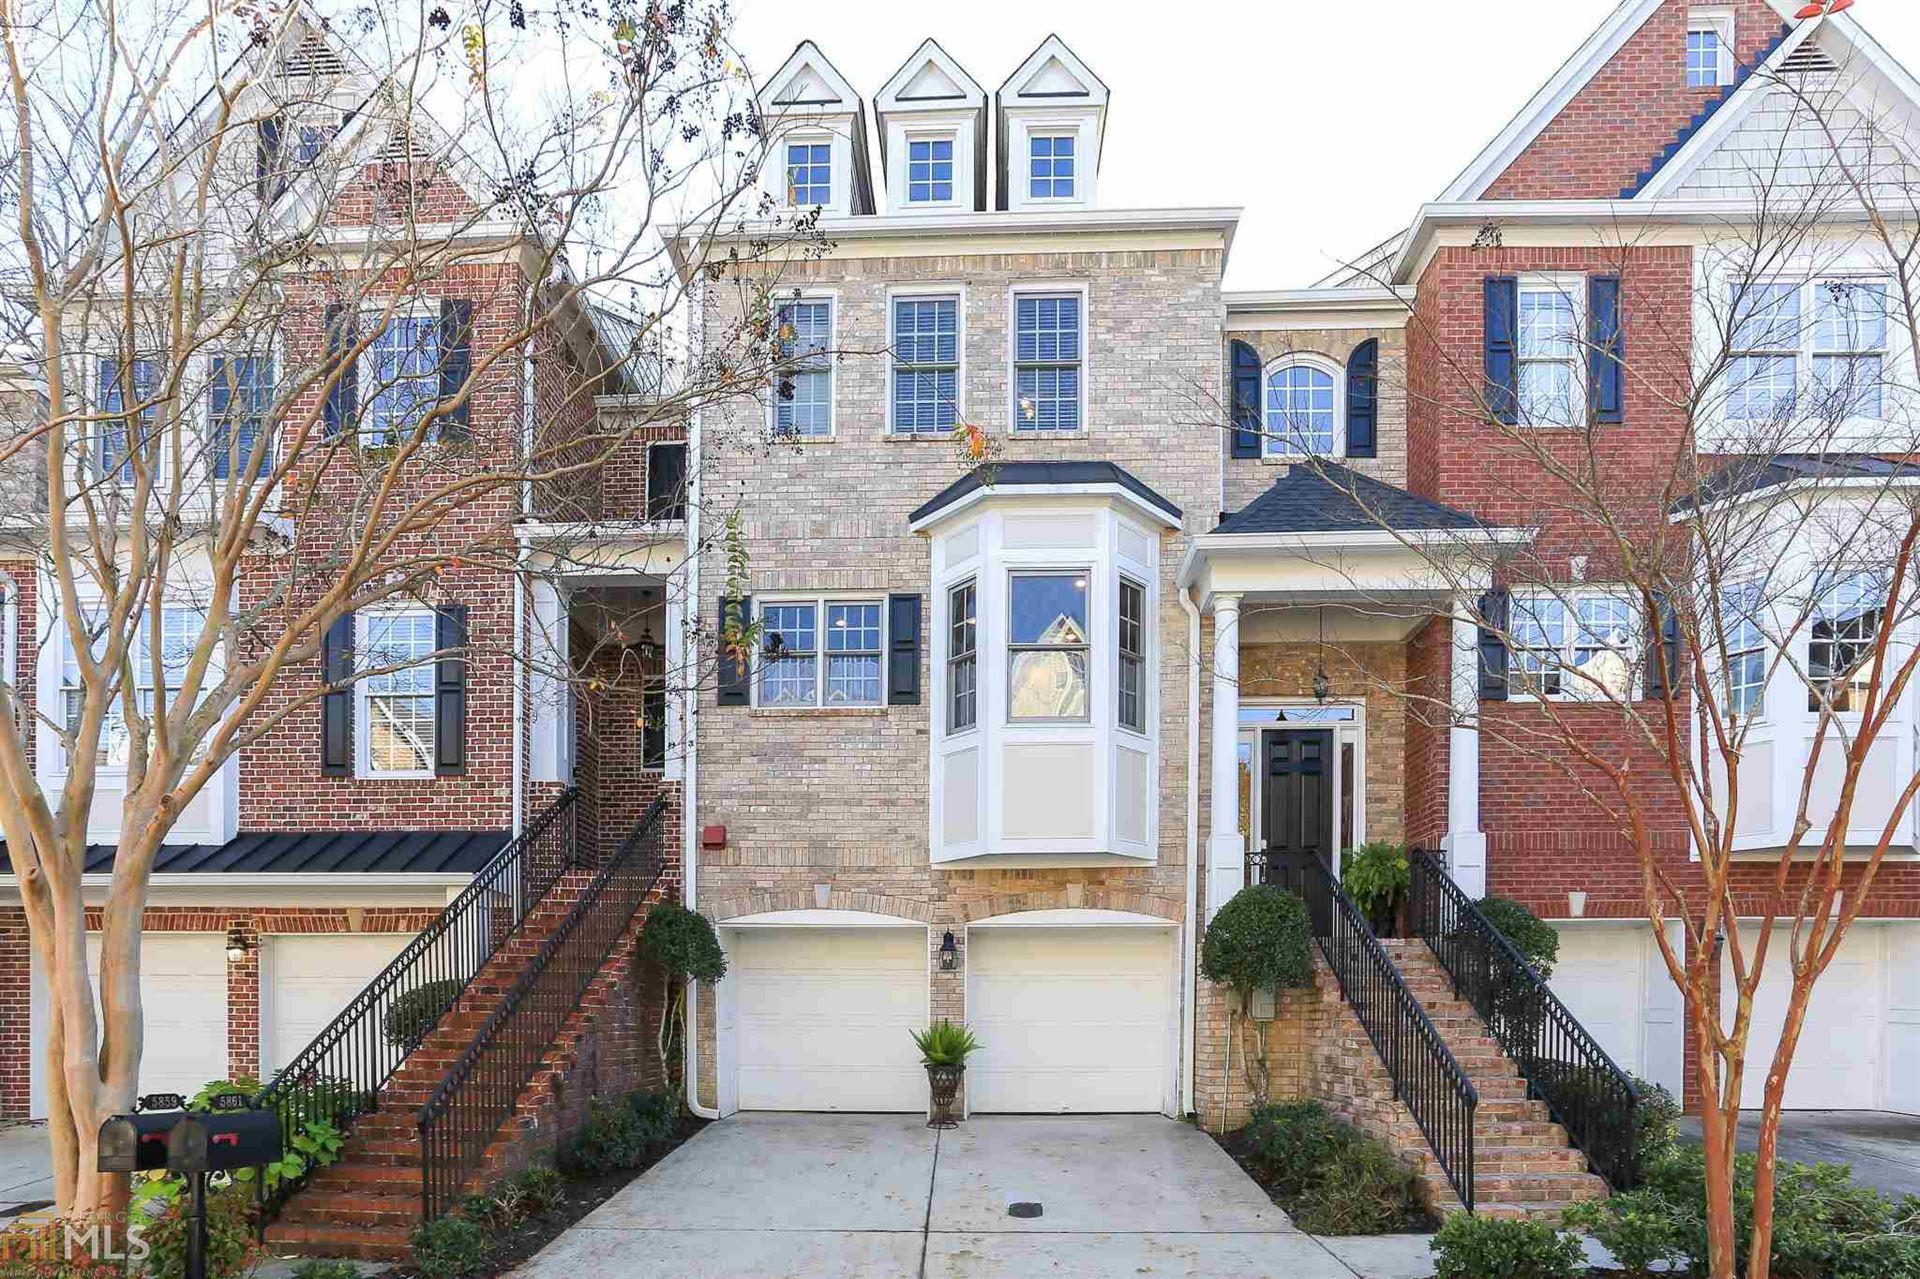 5861 Riverstone Cir, Atlanta, GA 30339 - MLS#: 8889591